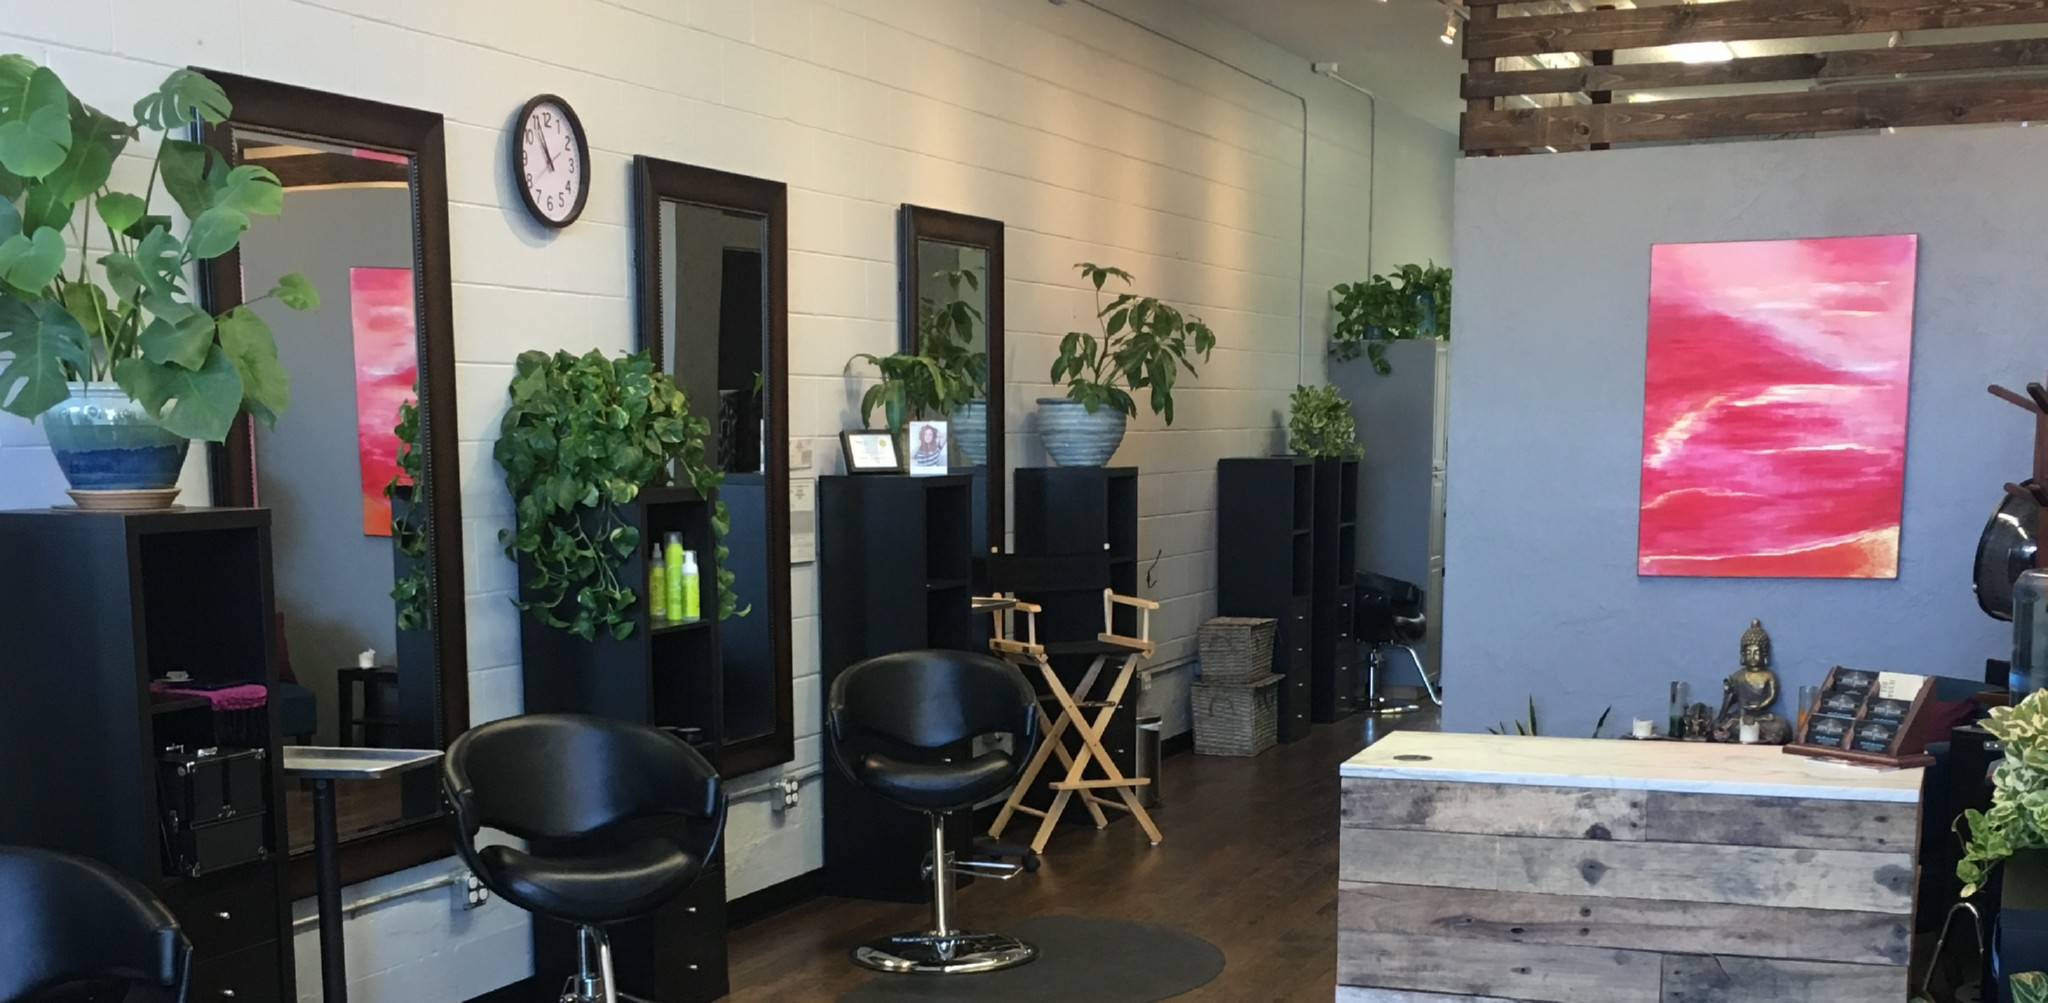 Hype Salon and Studio image 2